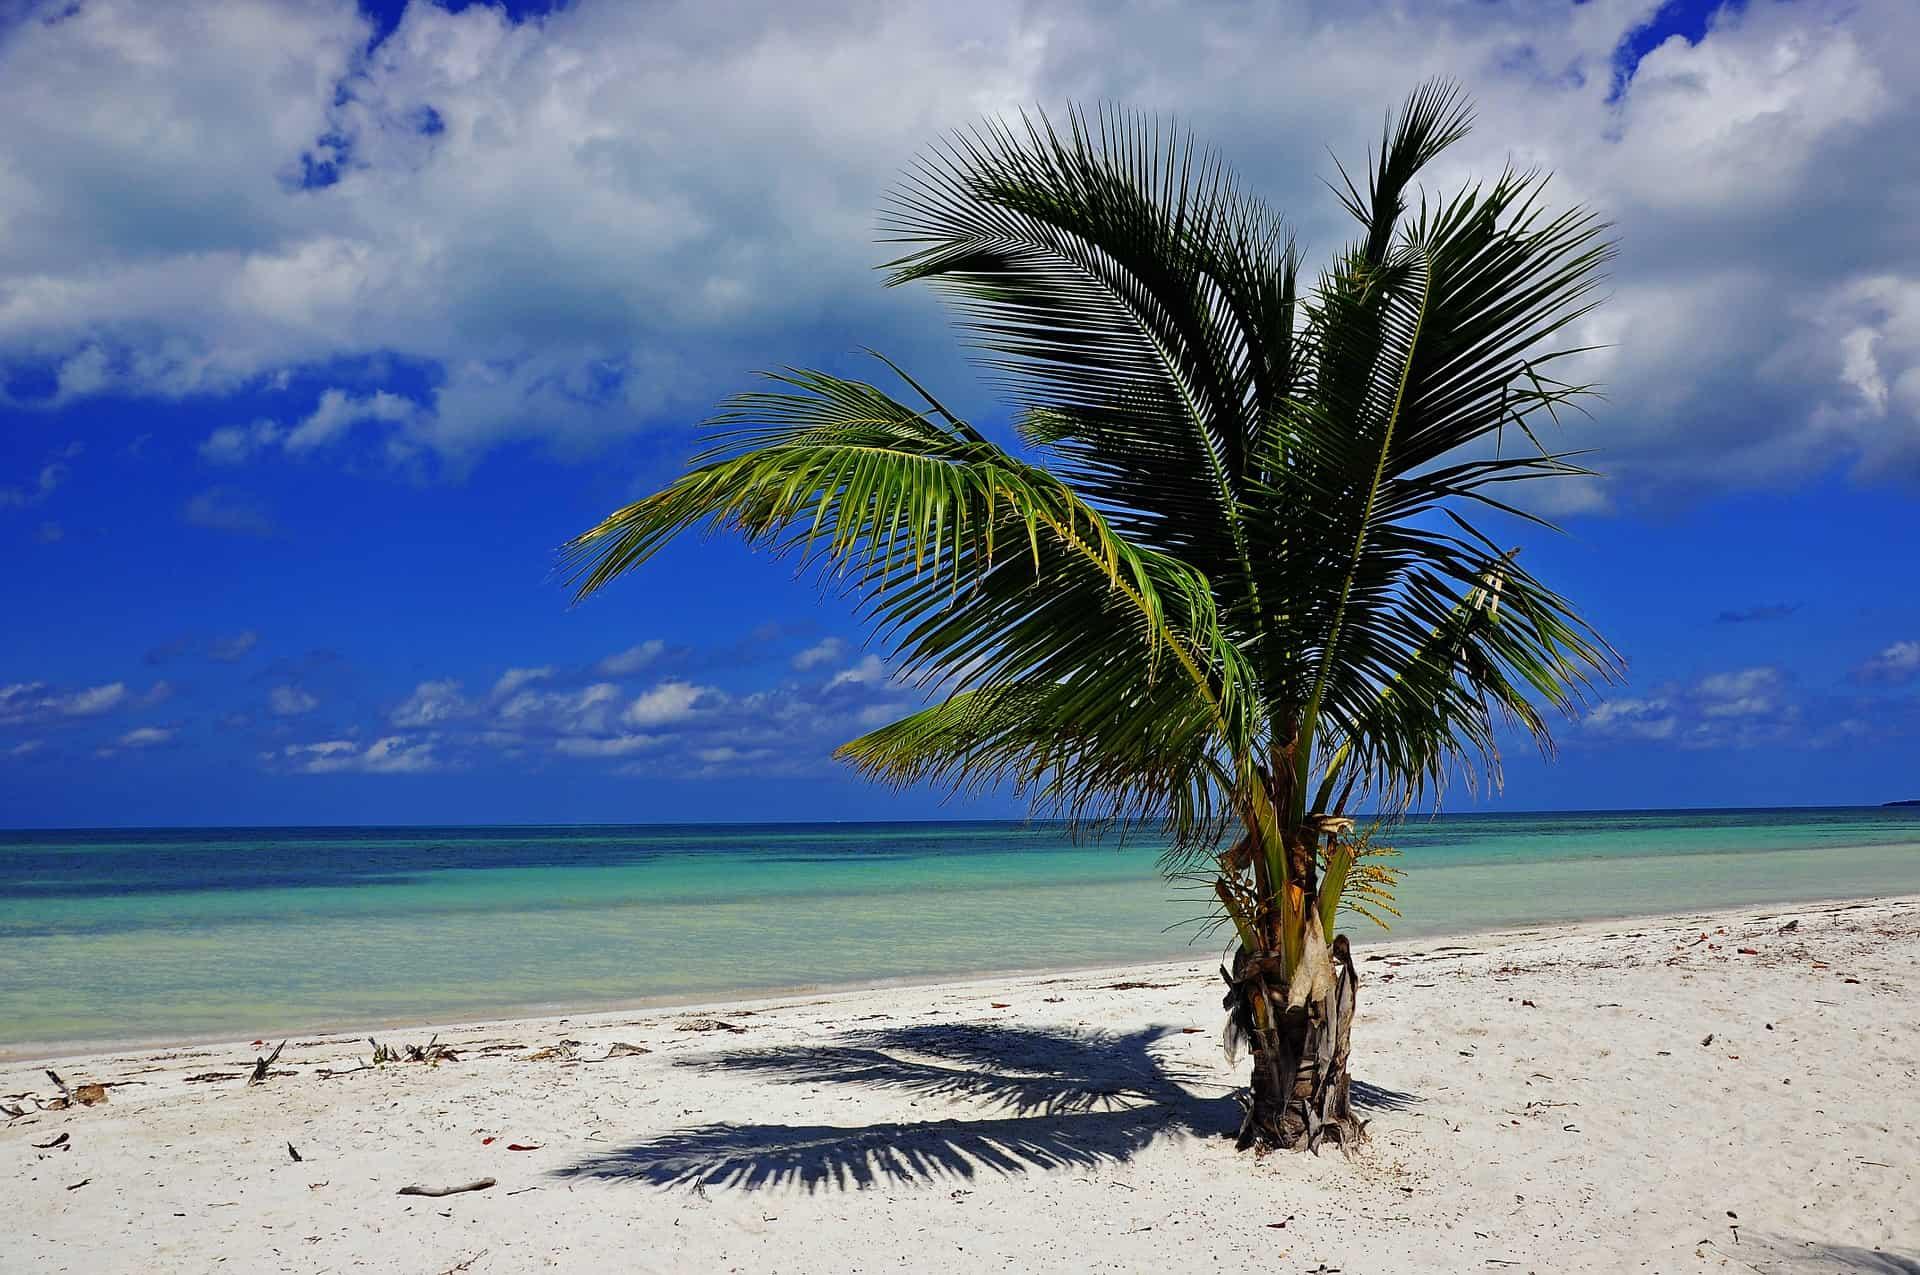 Eine Woche Kuba All Inclusive günstig ab 692,00€ = Last Minute !